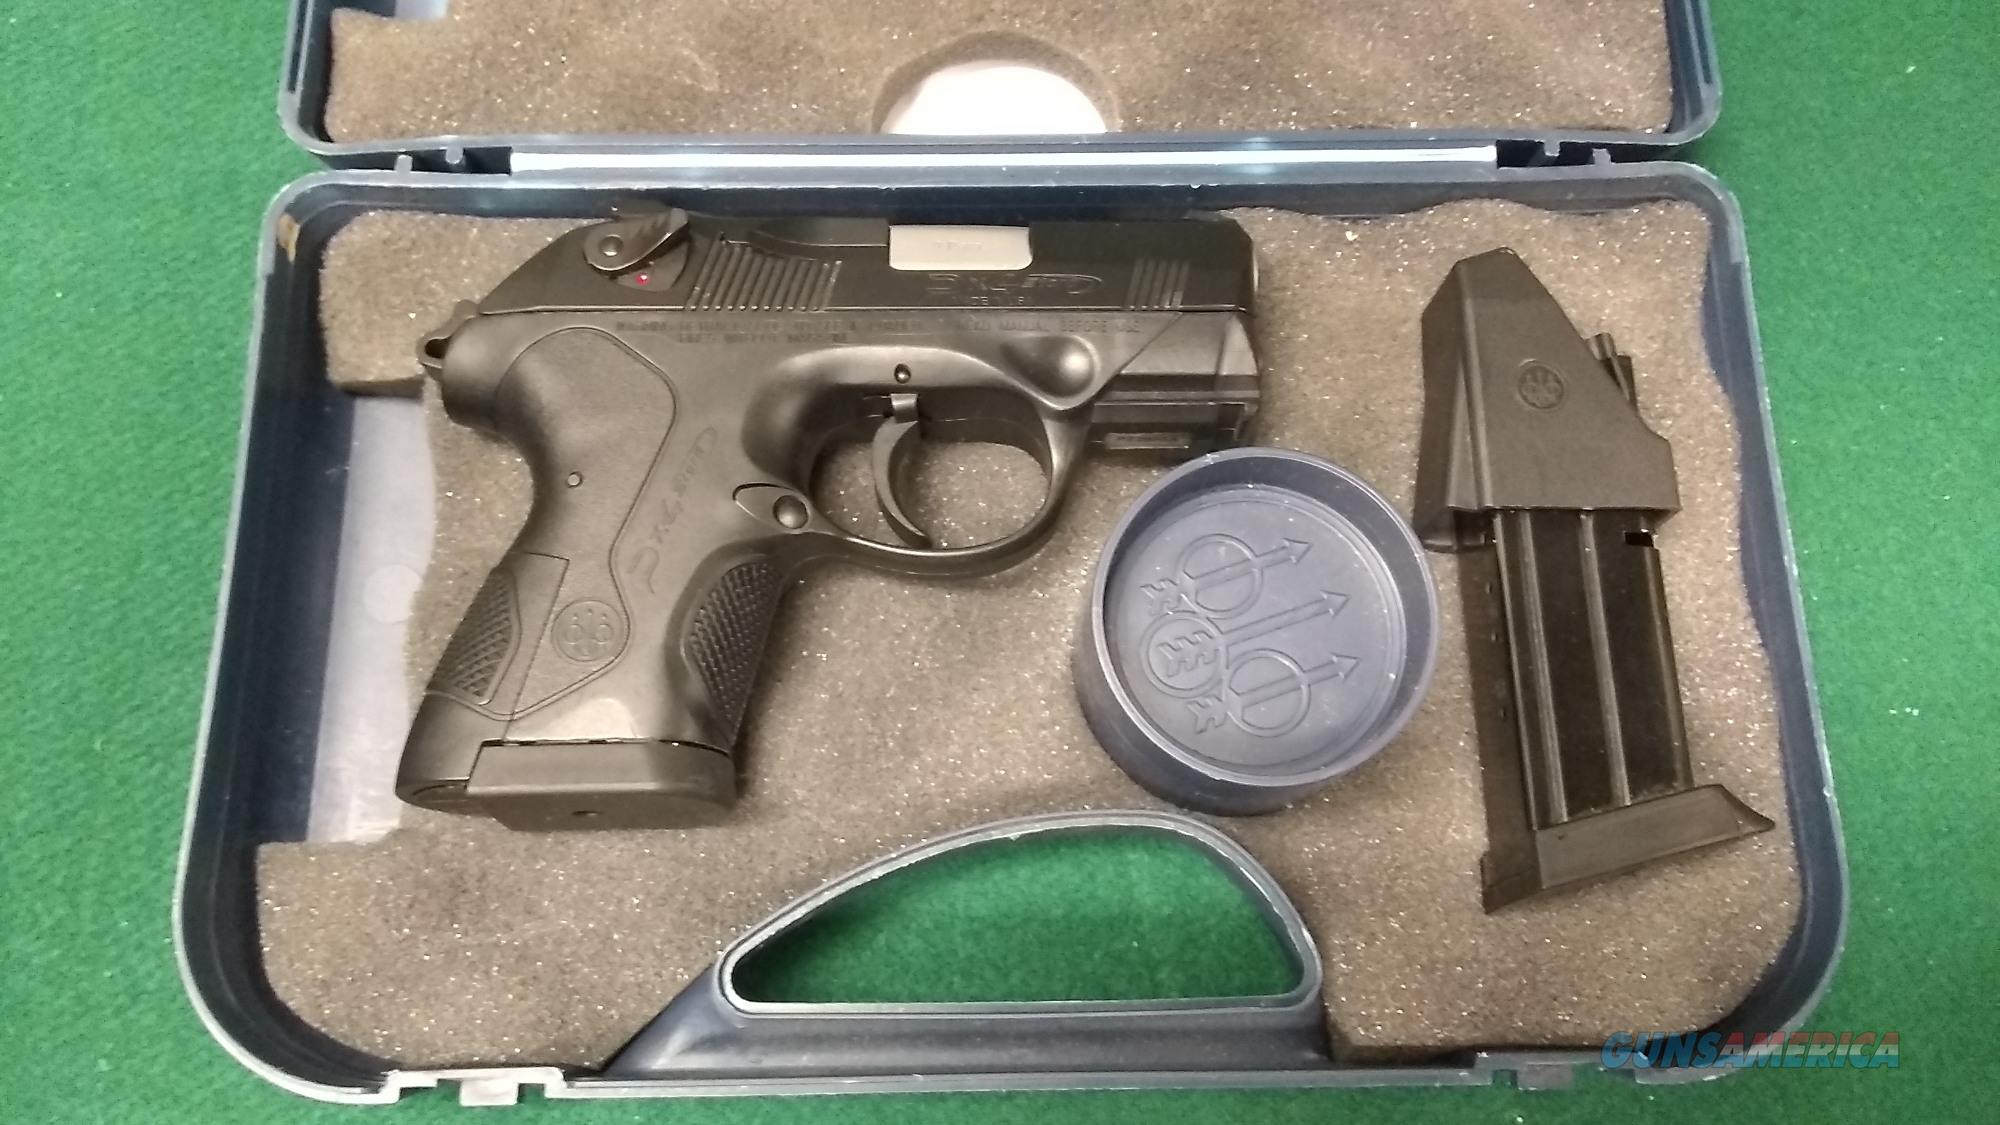 Beretta PX4 Sub Compact 9mm   Guns > Pistols > Beretta Pistols > Polymer Frame